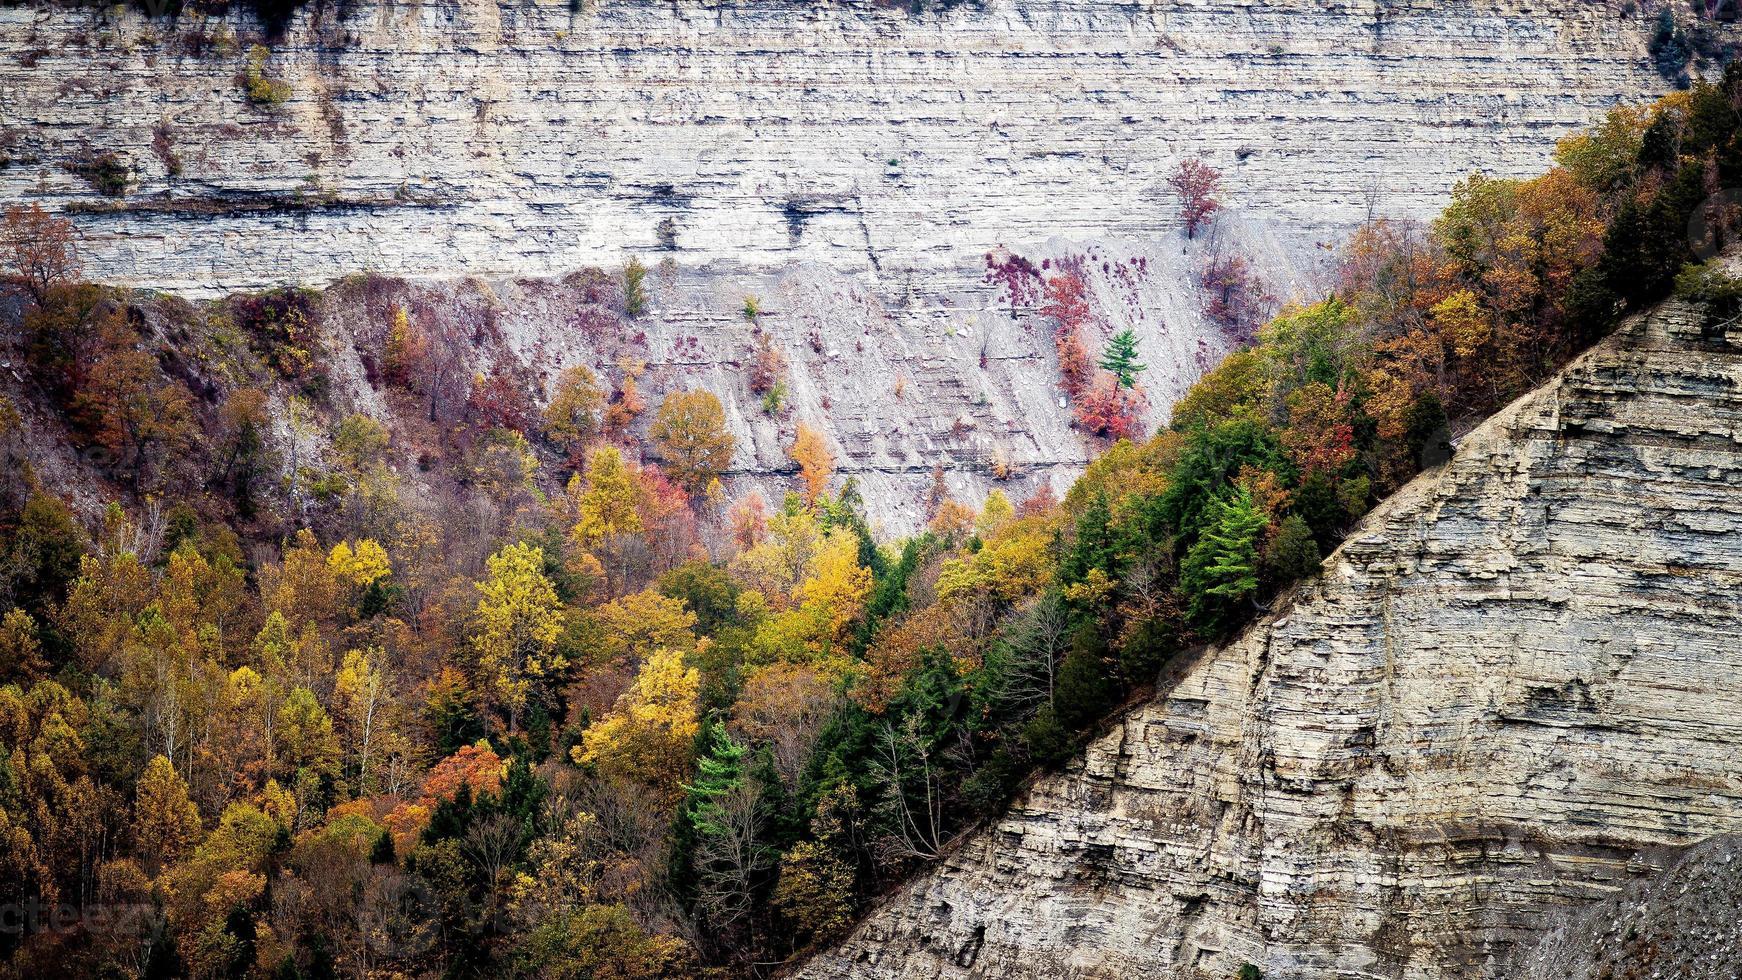 Scenic autumn landscape at Letchworth State Park photo